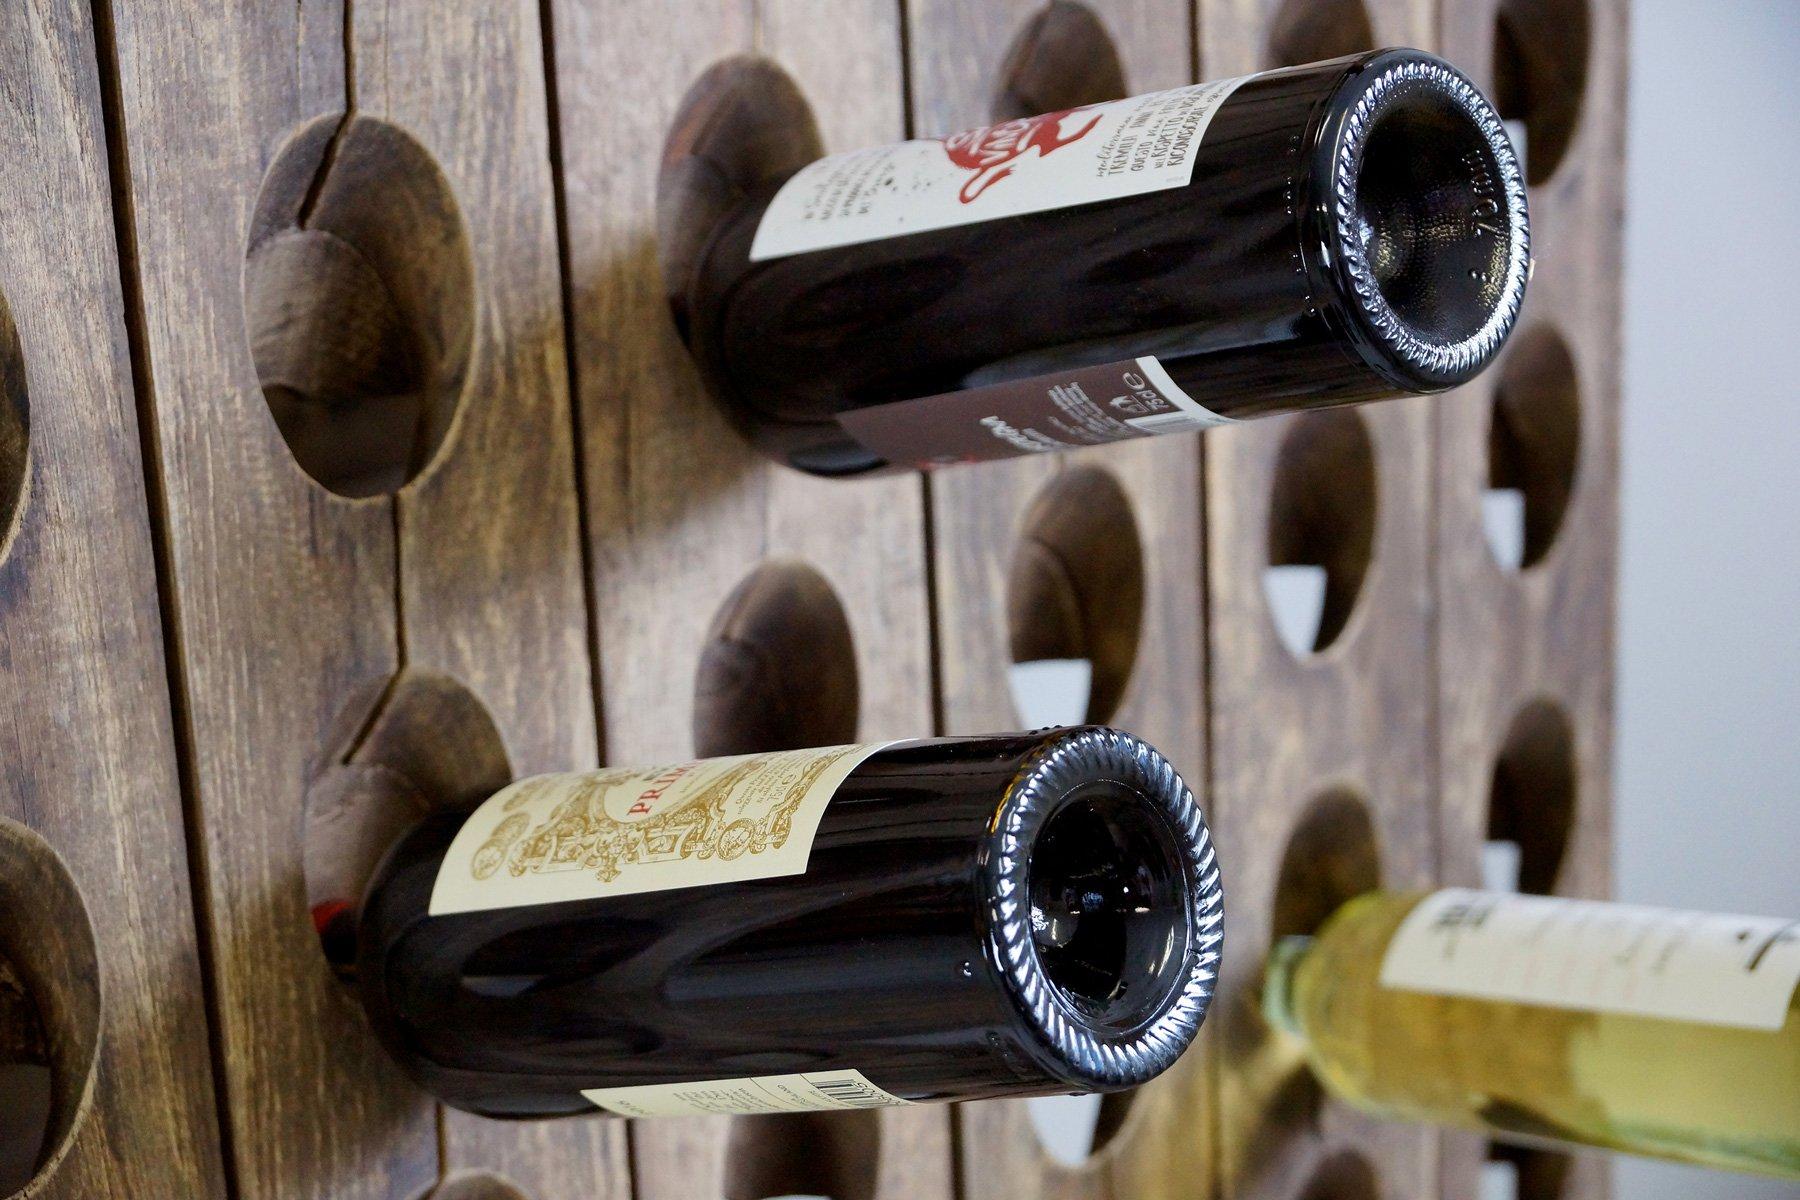 Able Vintage Bronze Vine Bottle Stand Skilful Manufacture Kitchen, Dining & Bar